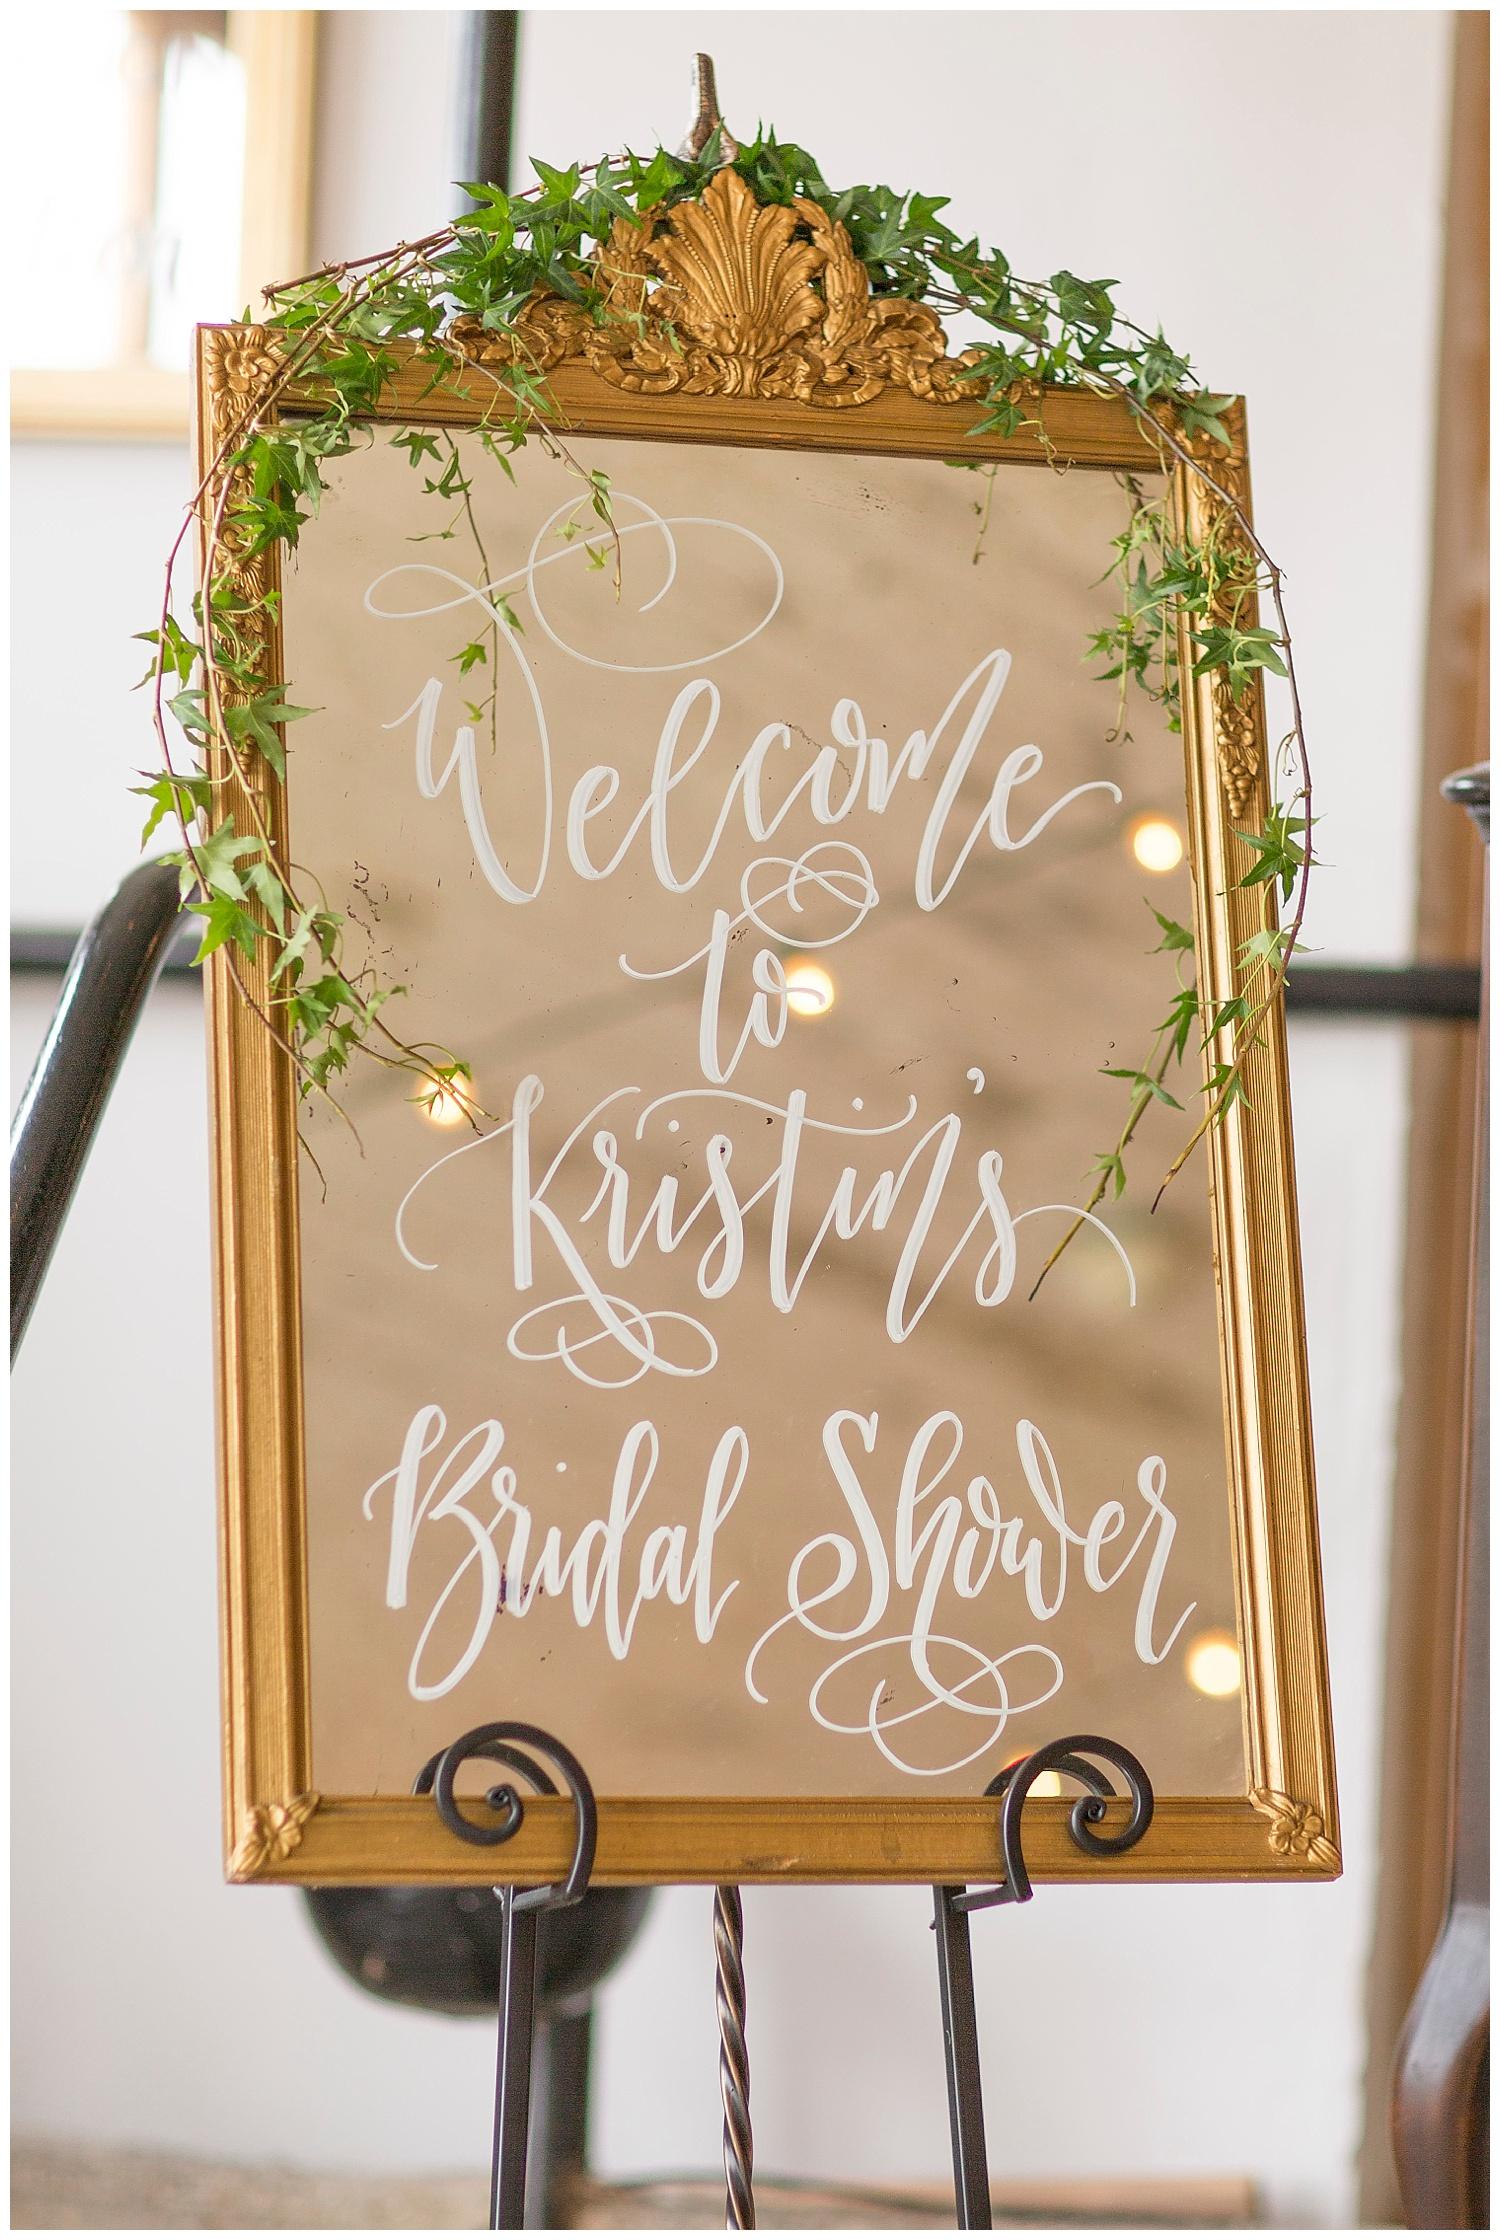 Gilbertsville Farmhouse Wedding Inspiration | South New Berlin, NY | www.redoakweddings.com